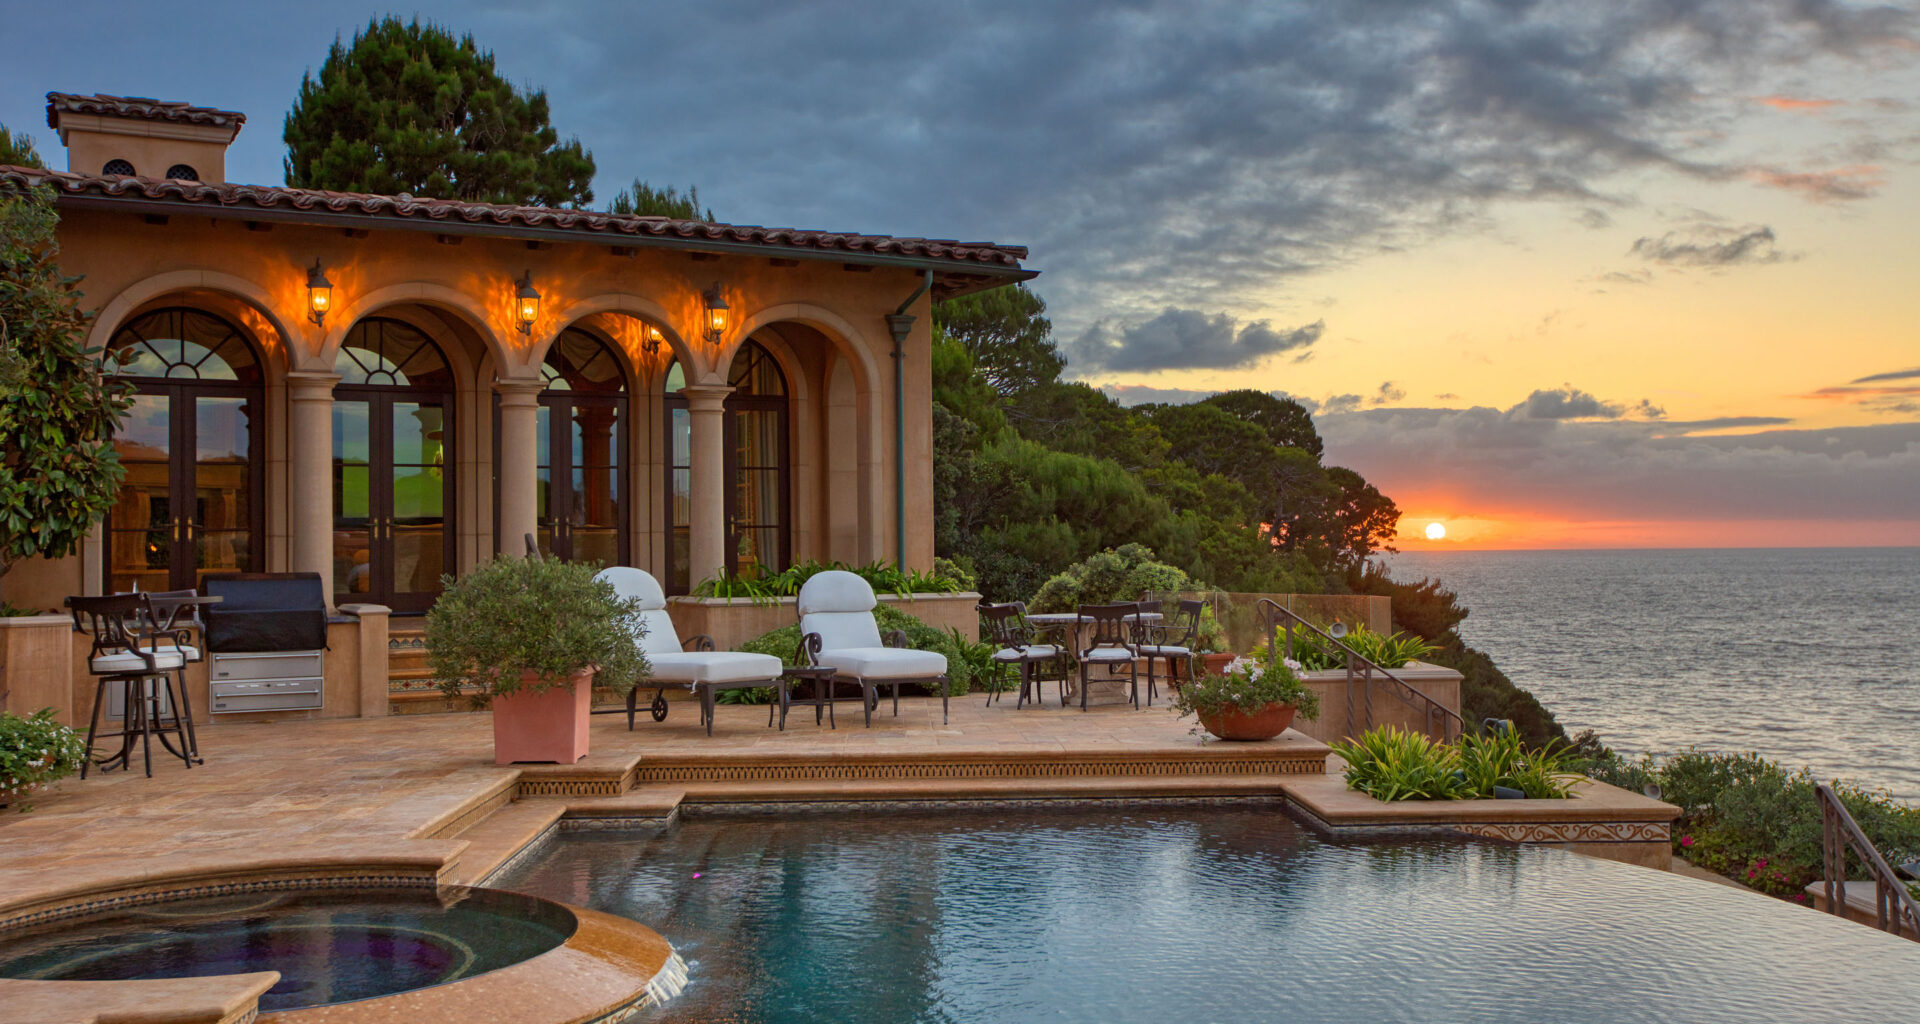 Megan Neel, RE/MAX Estate Properties, Palos Verdes Estates, Palos Verdes,